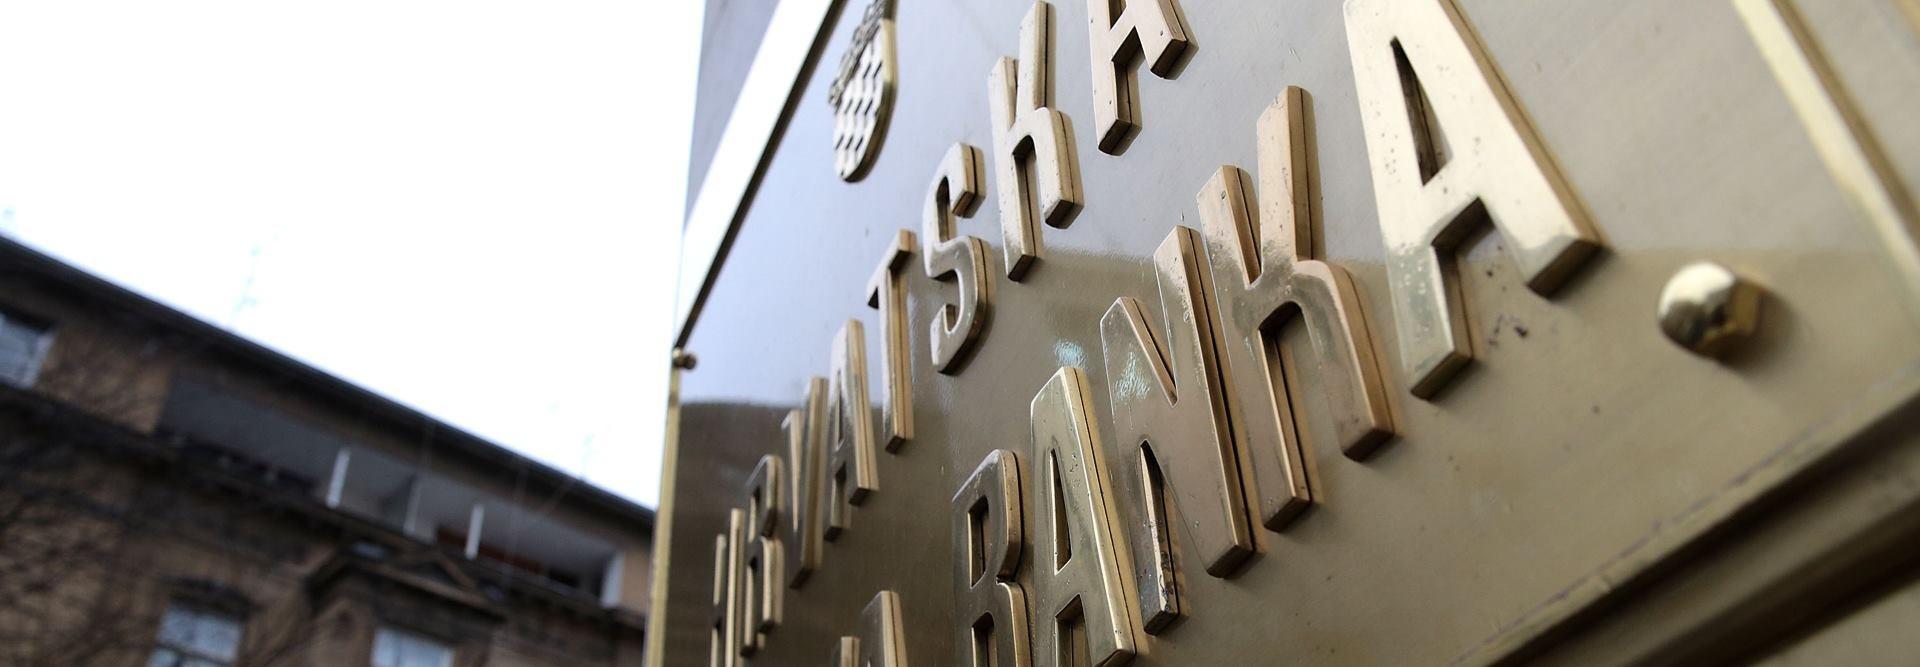 HNB predložio otvaranje stečajnog postupka nad Bankom splitsko-dalmatinskom